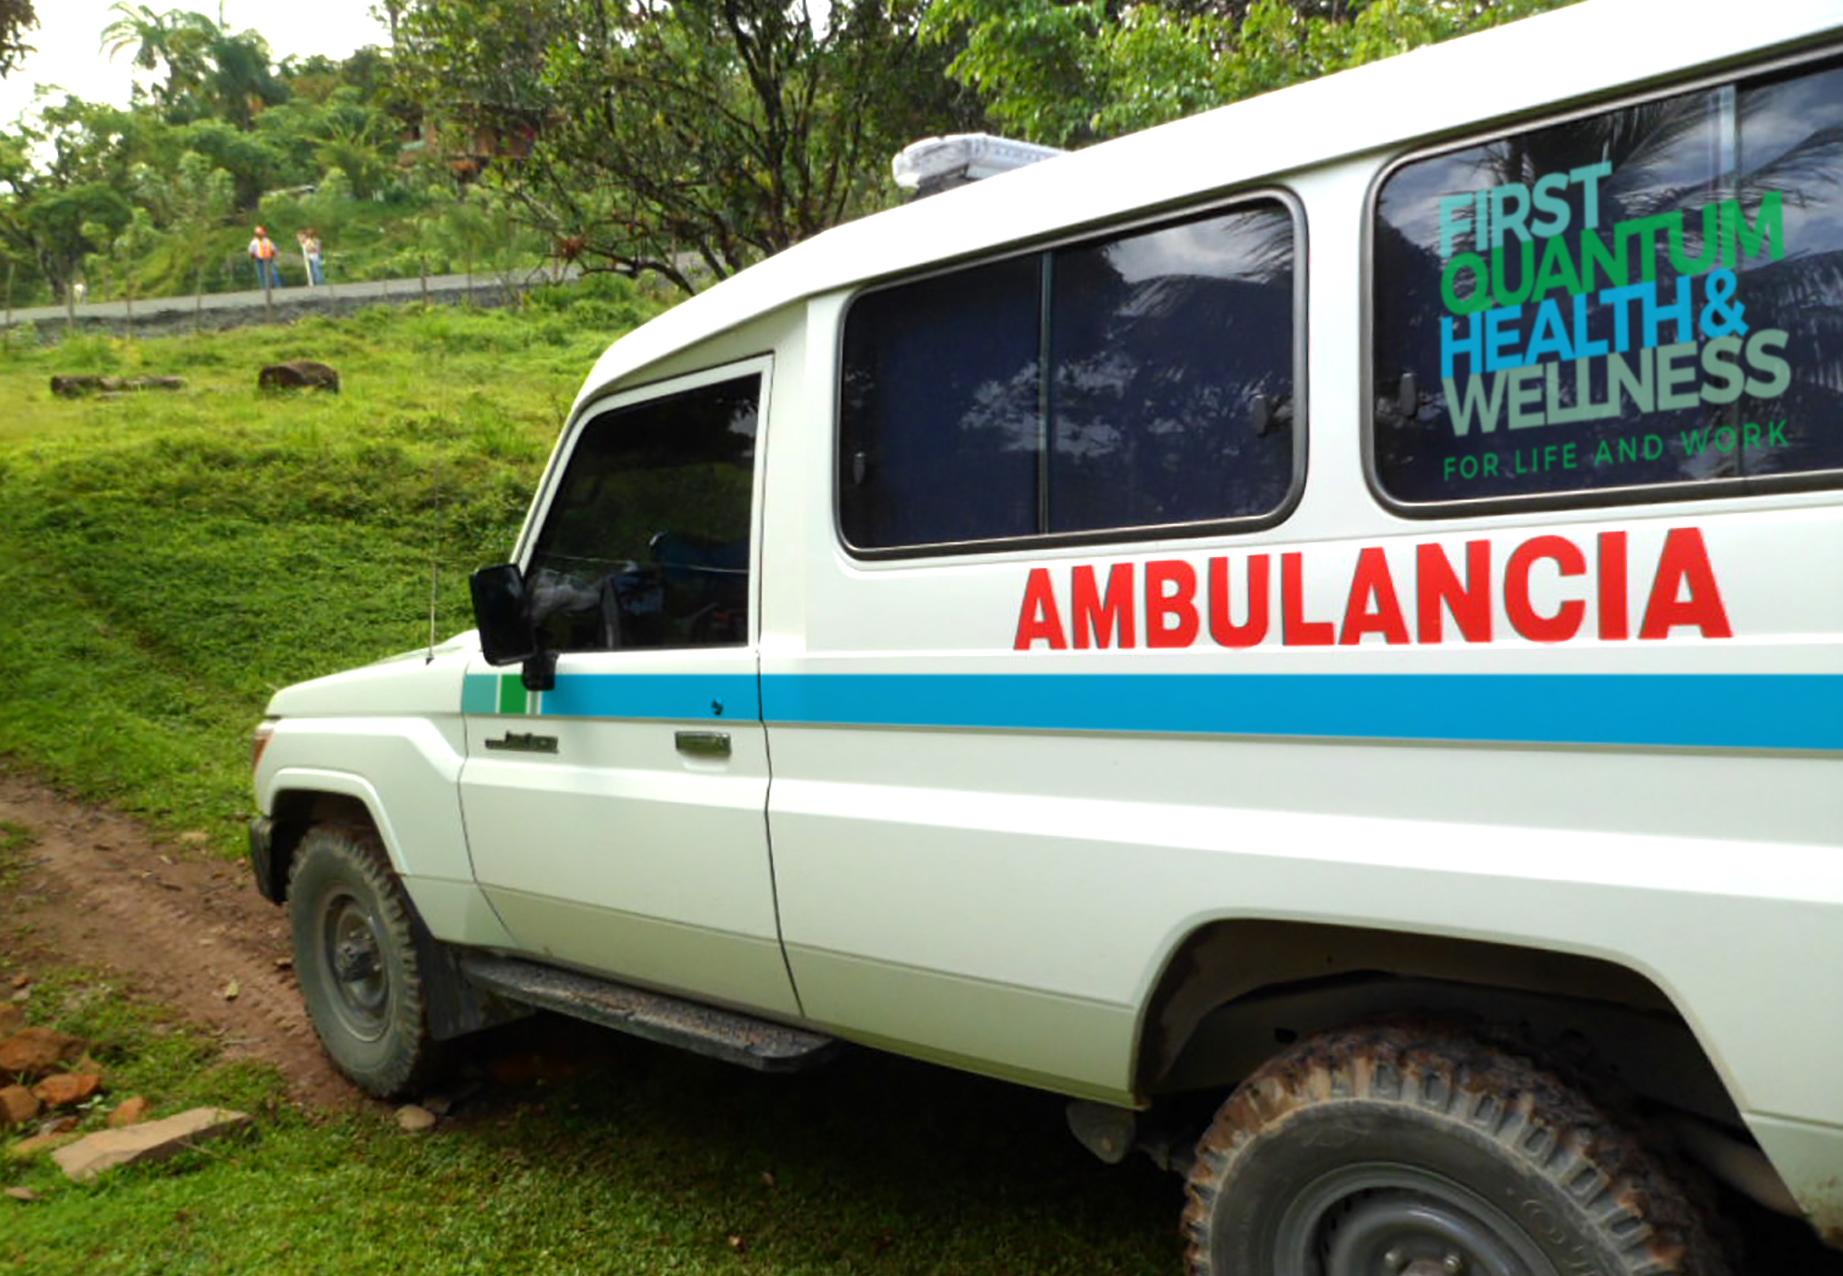 Chromatic_FQHW_ambulance.jpg